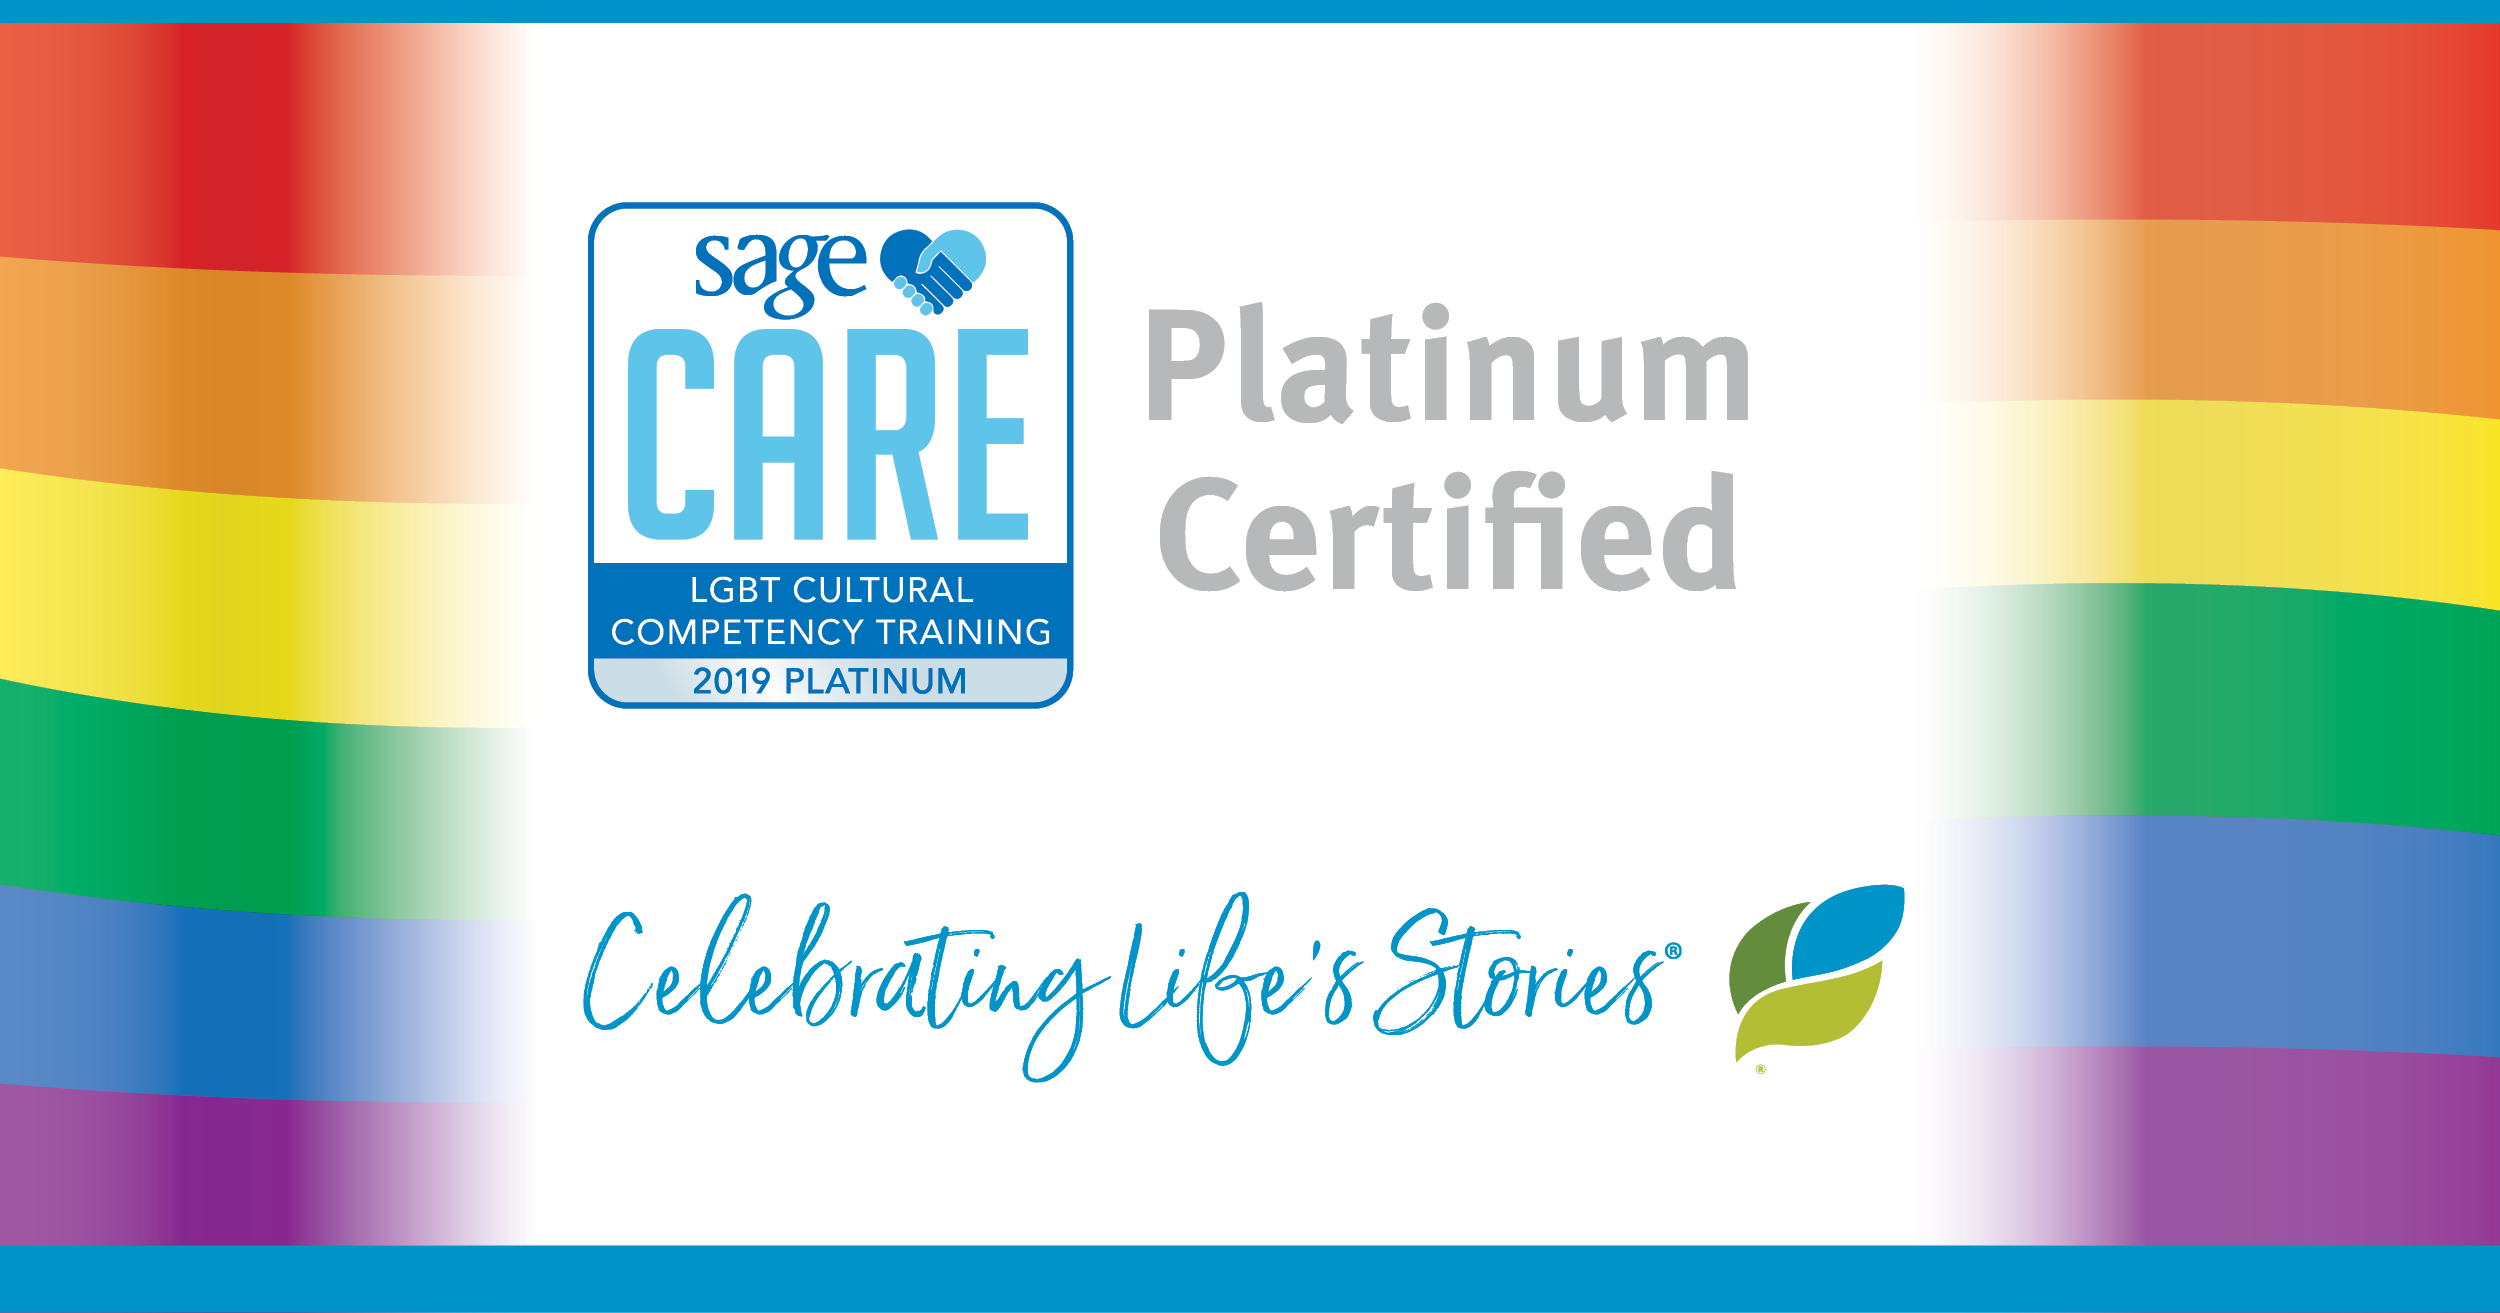 SAGECare Platinum Certified